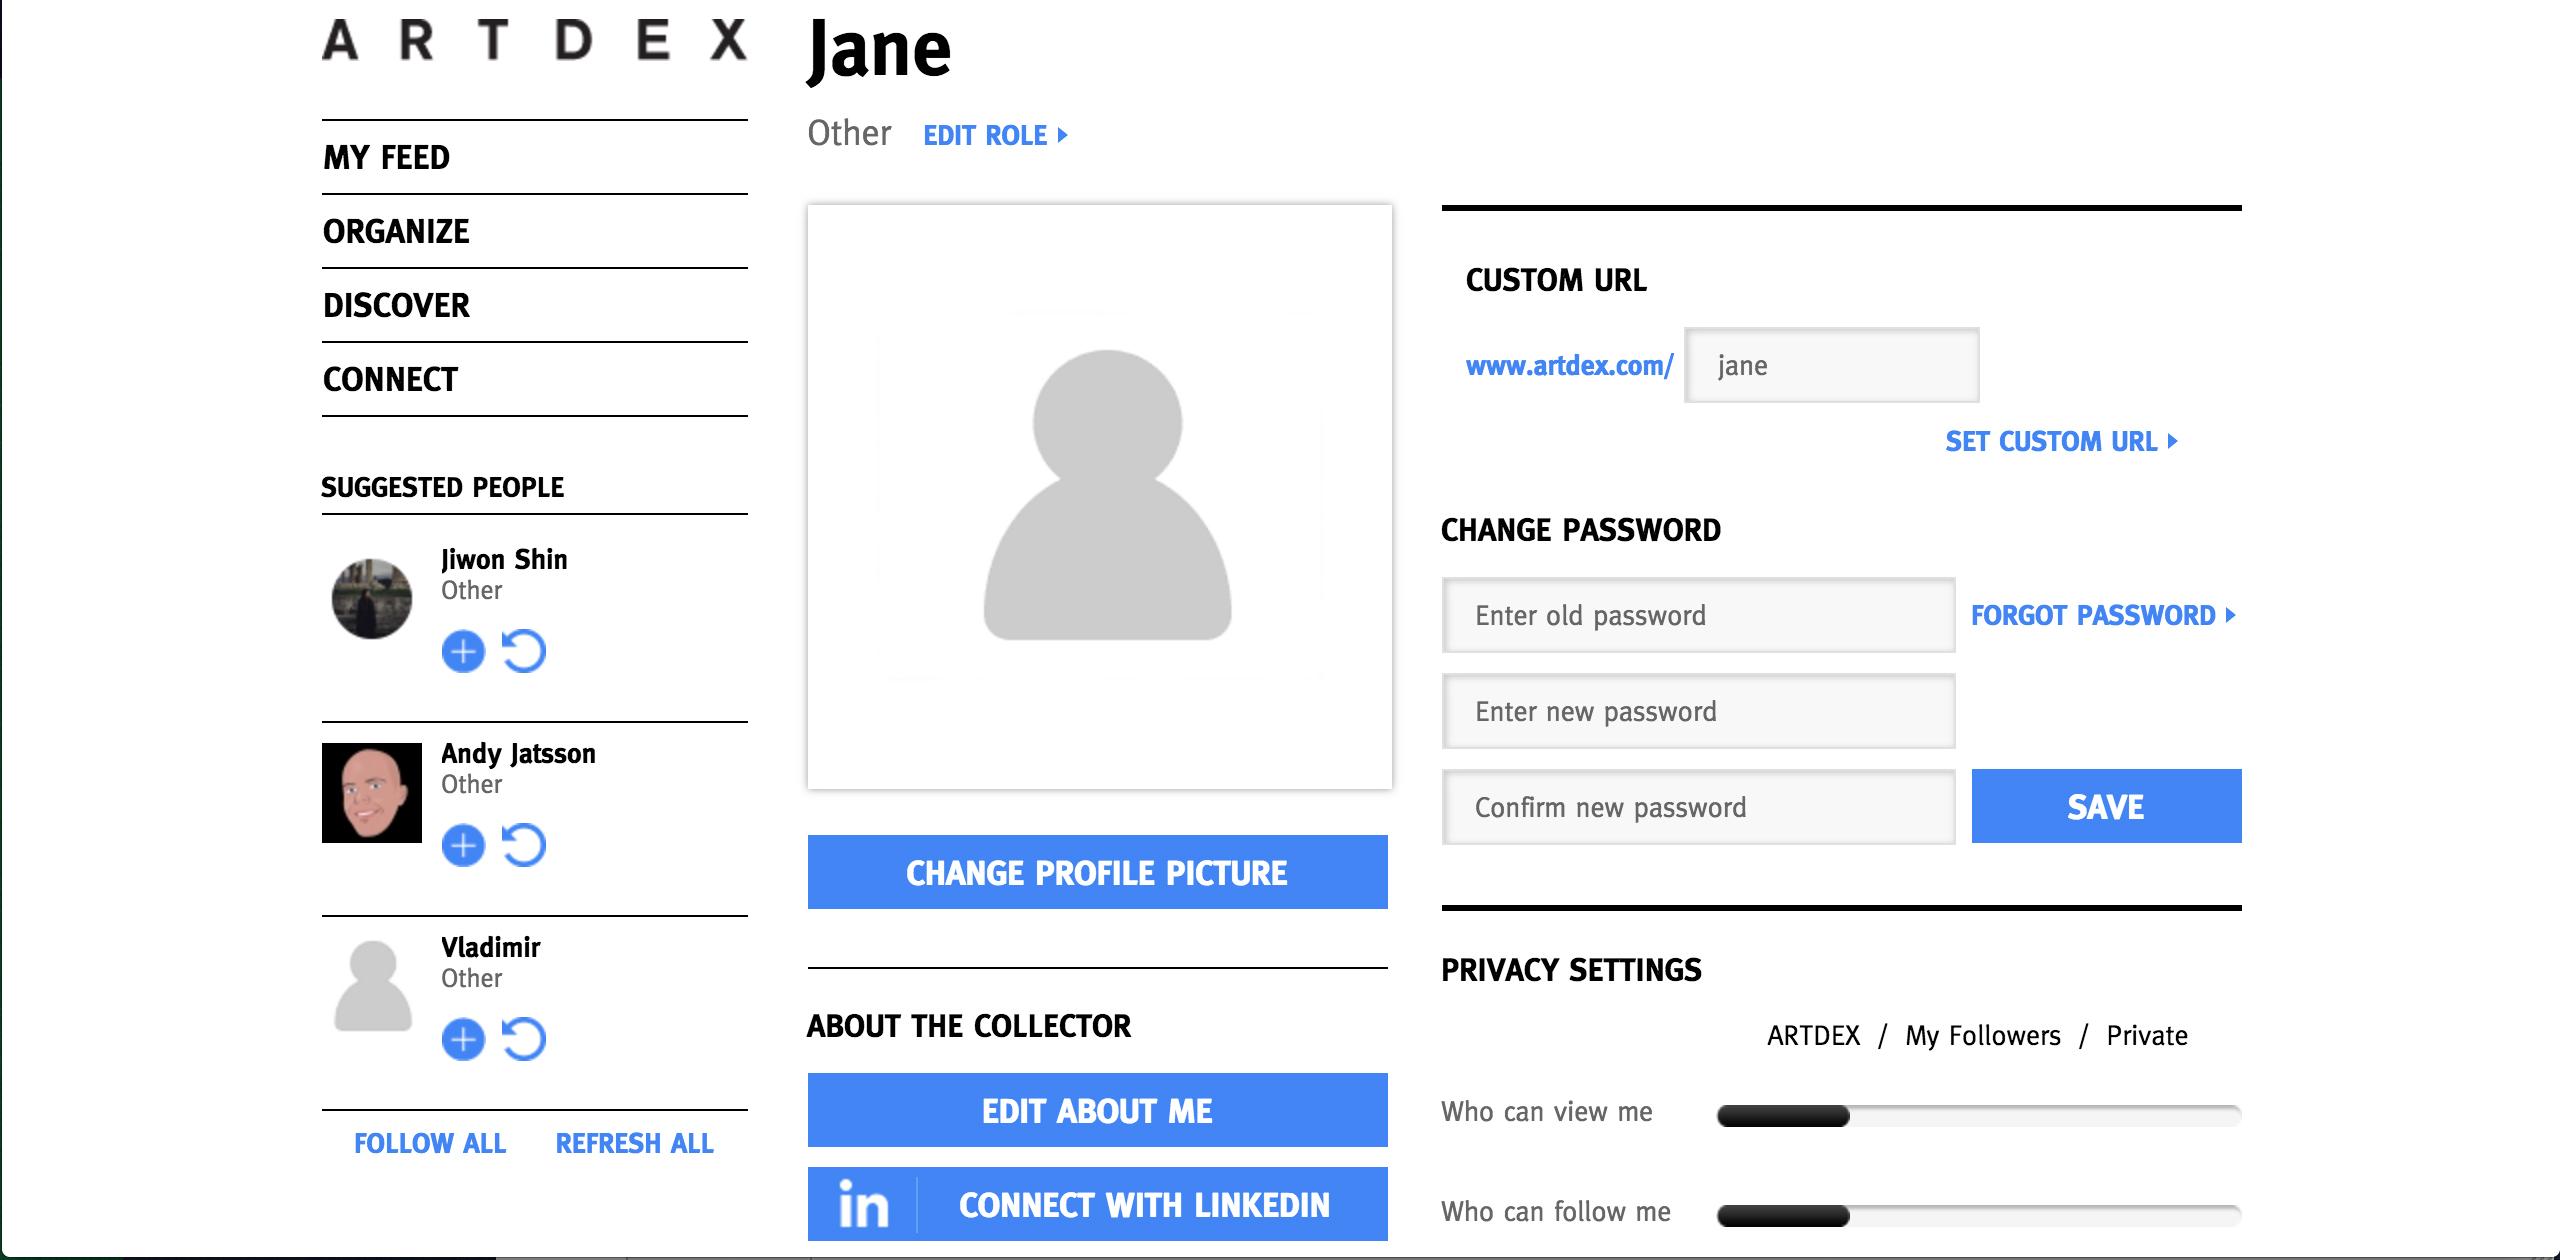 Setting up your ARTDEX profile